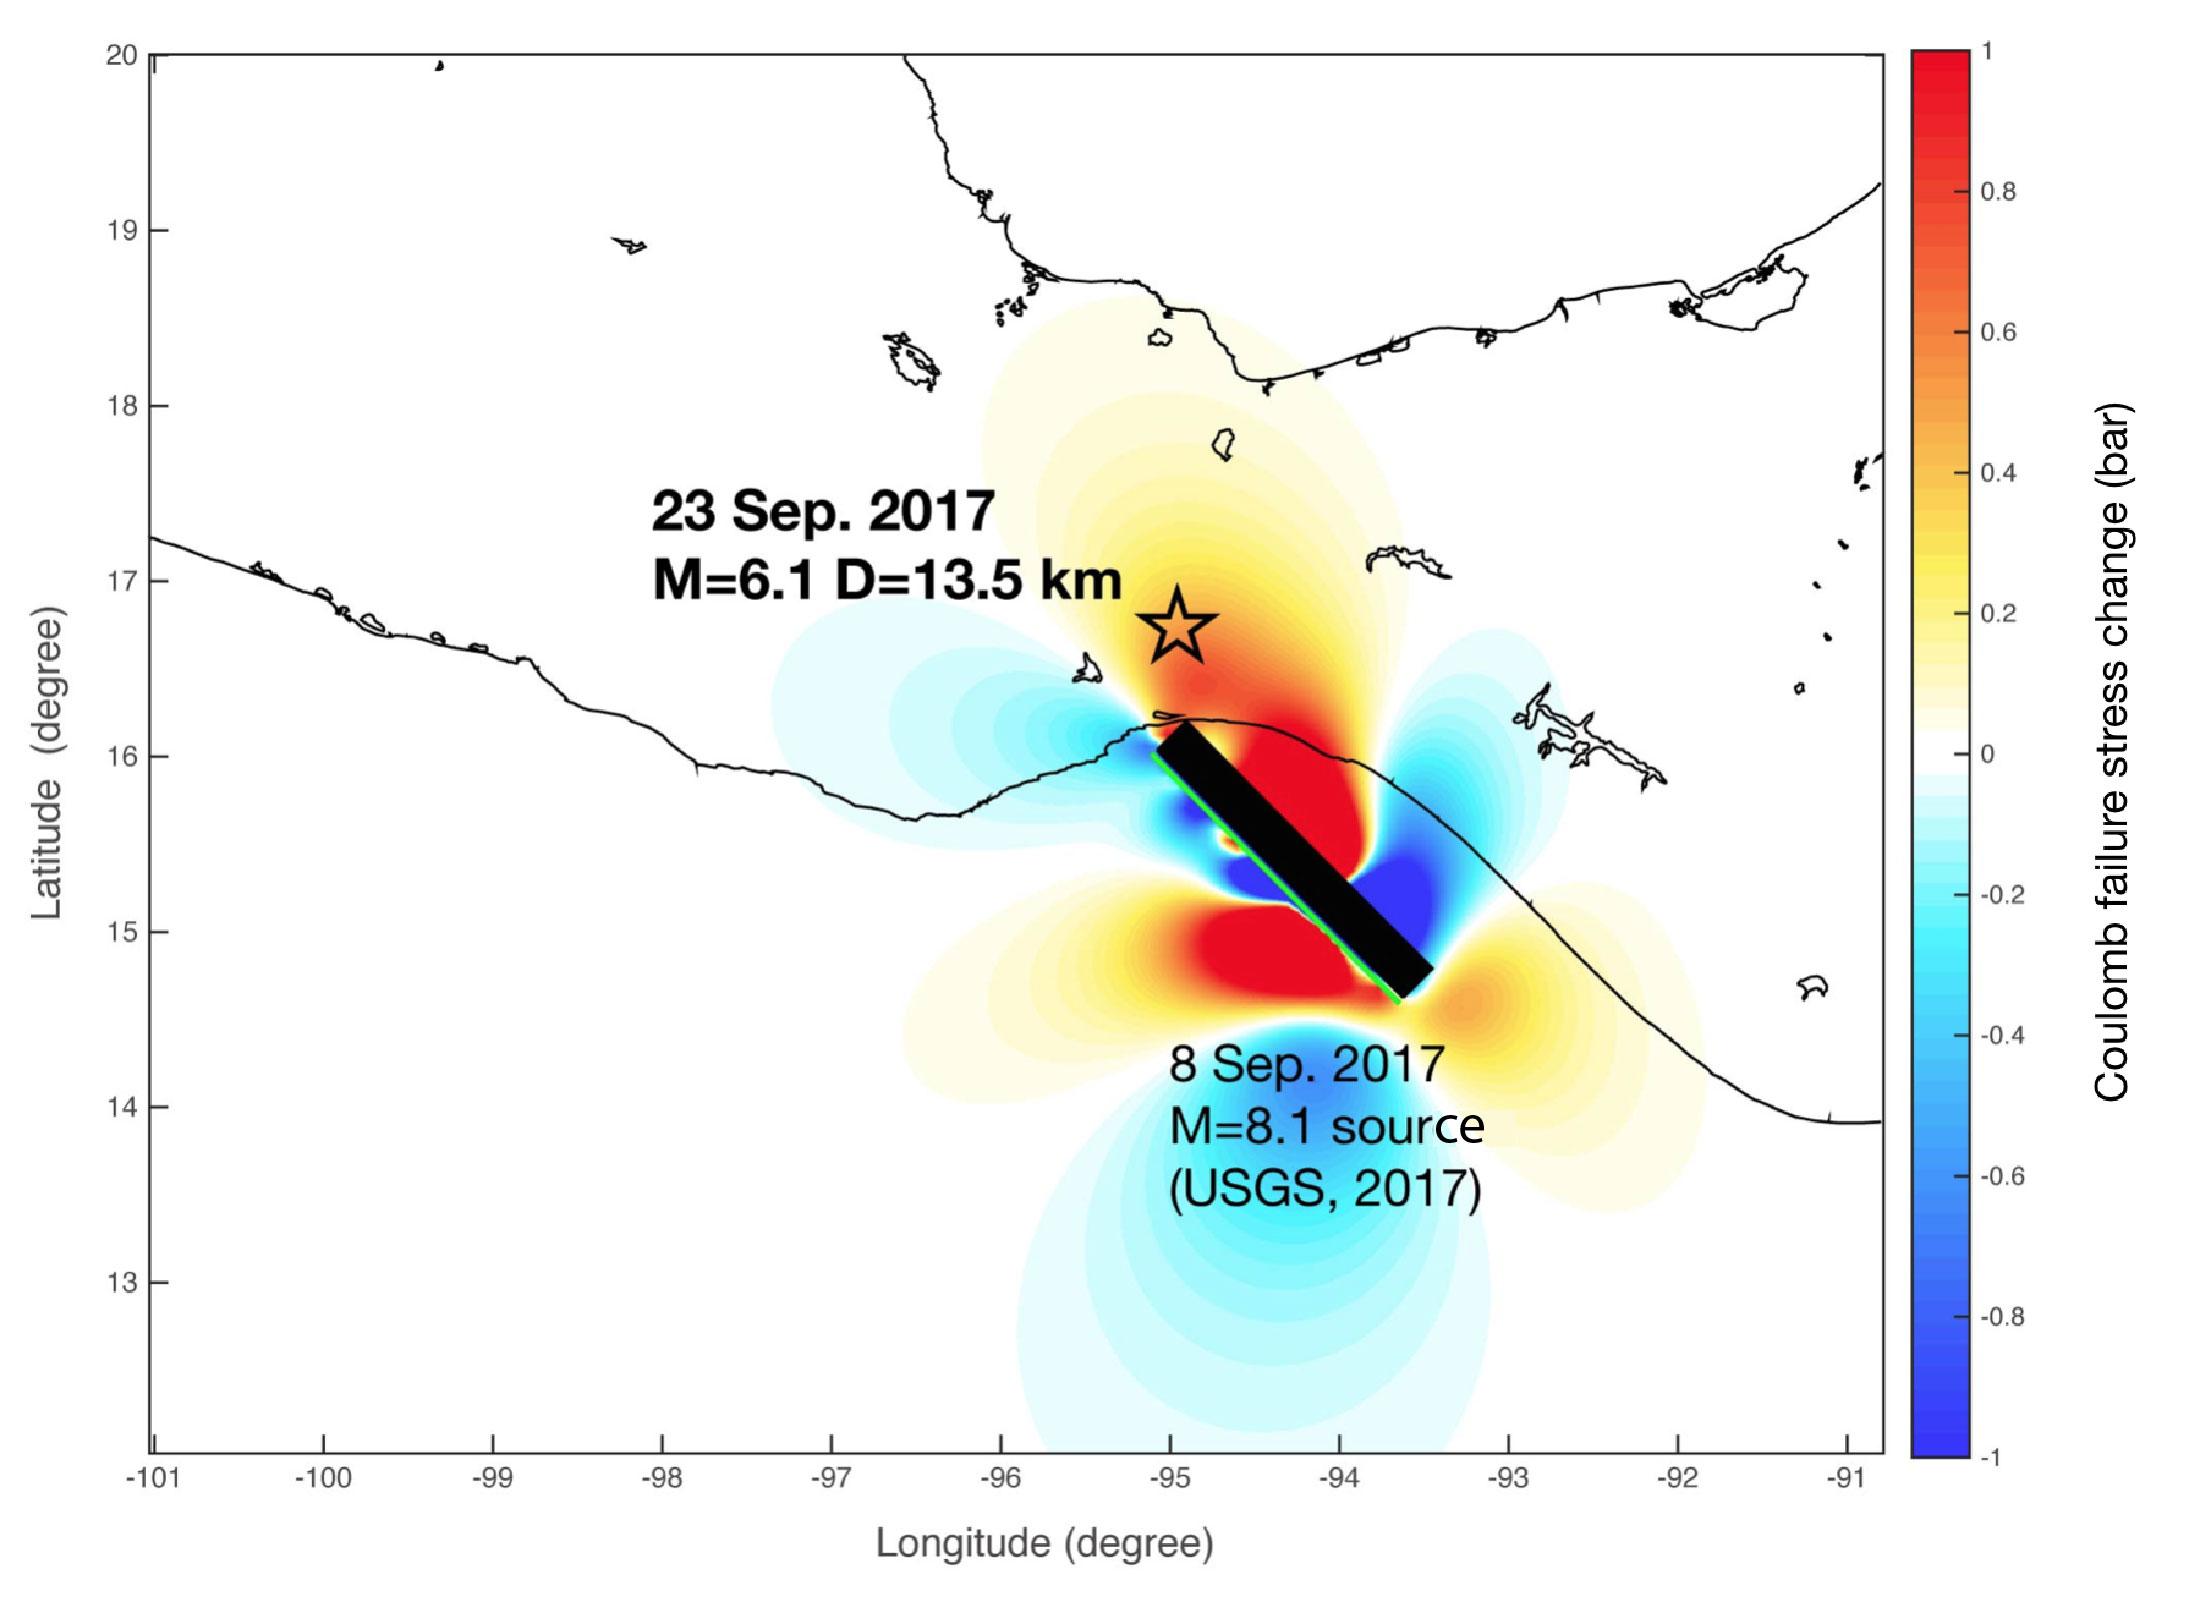 coulomb-analysis-chiapas-earthquake